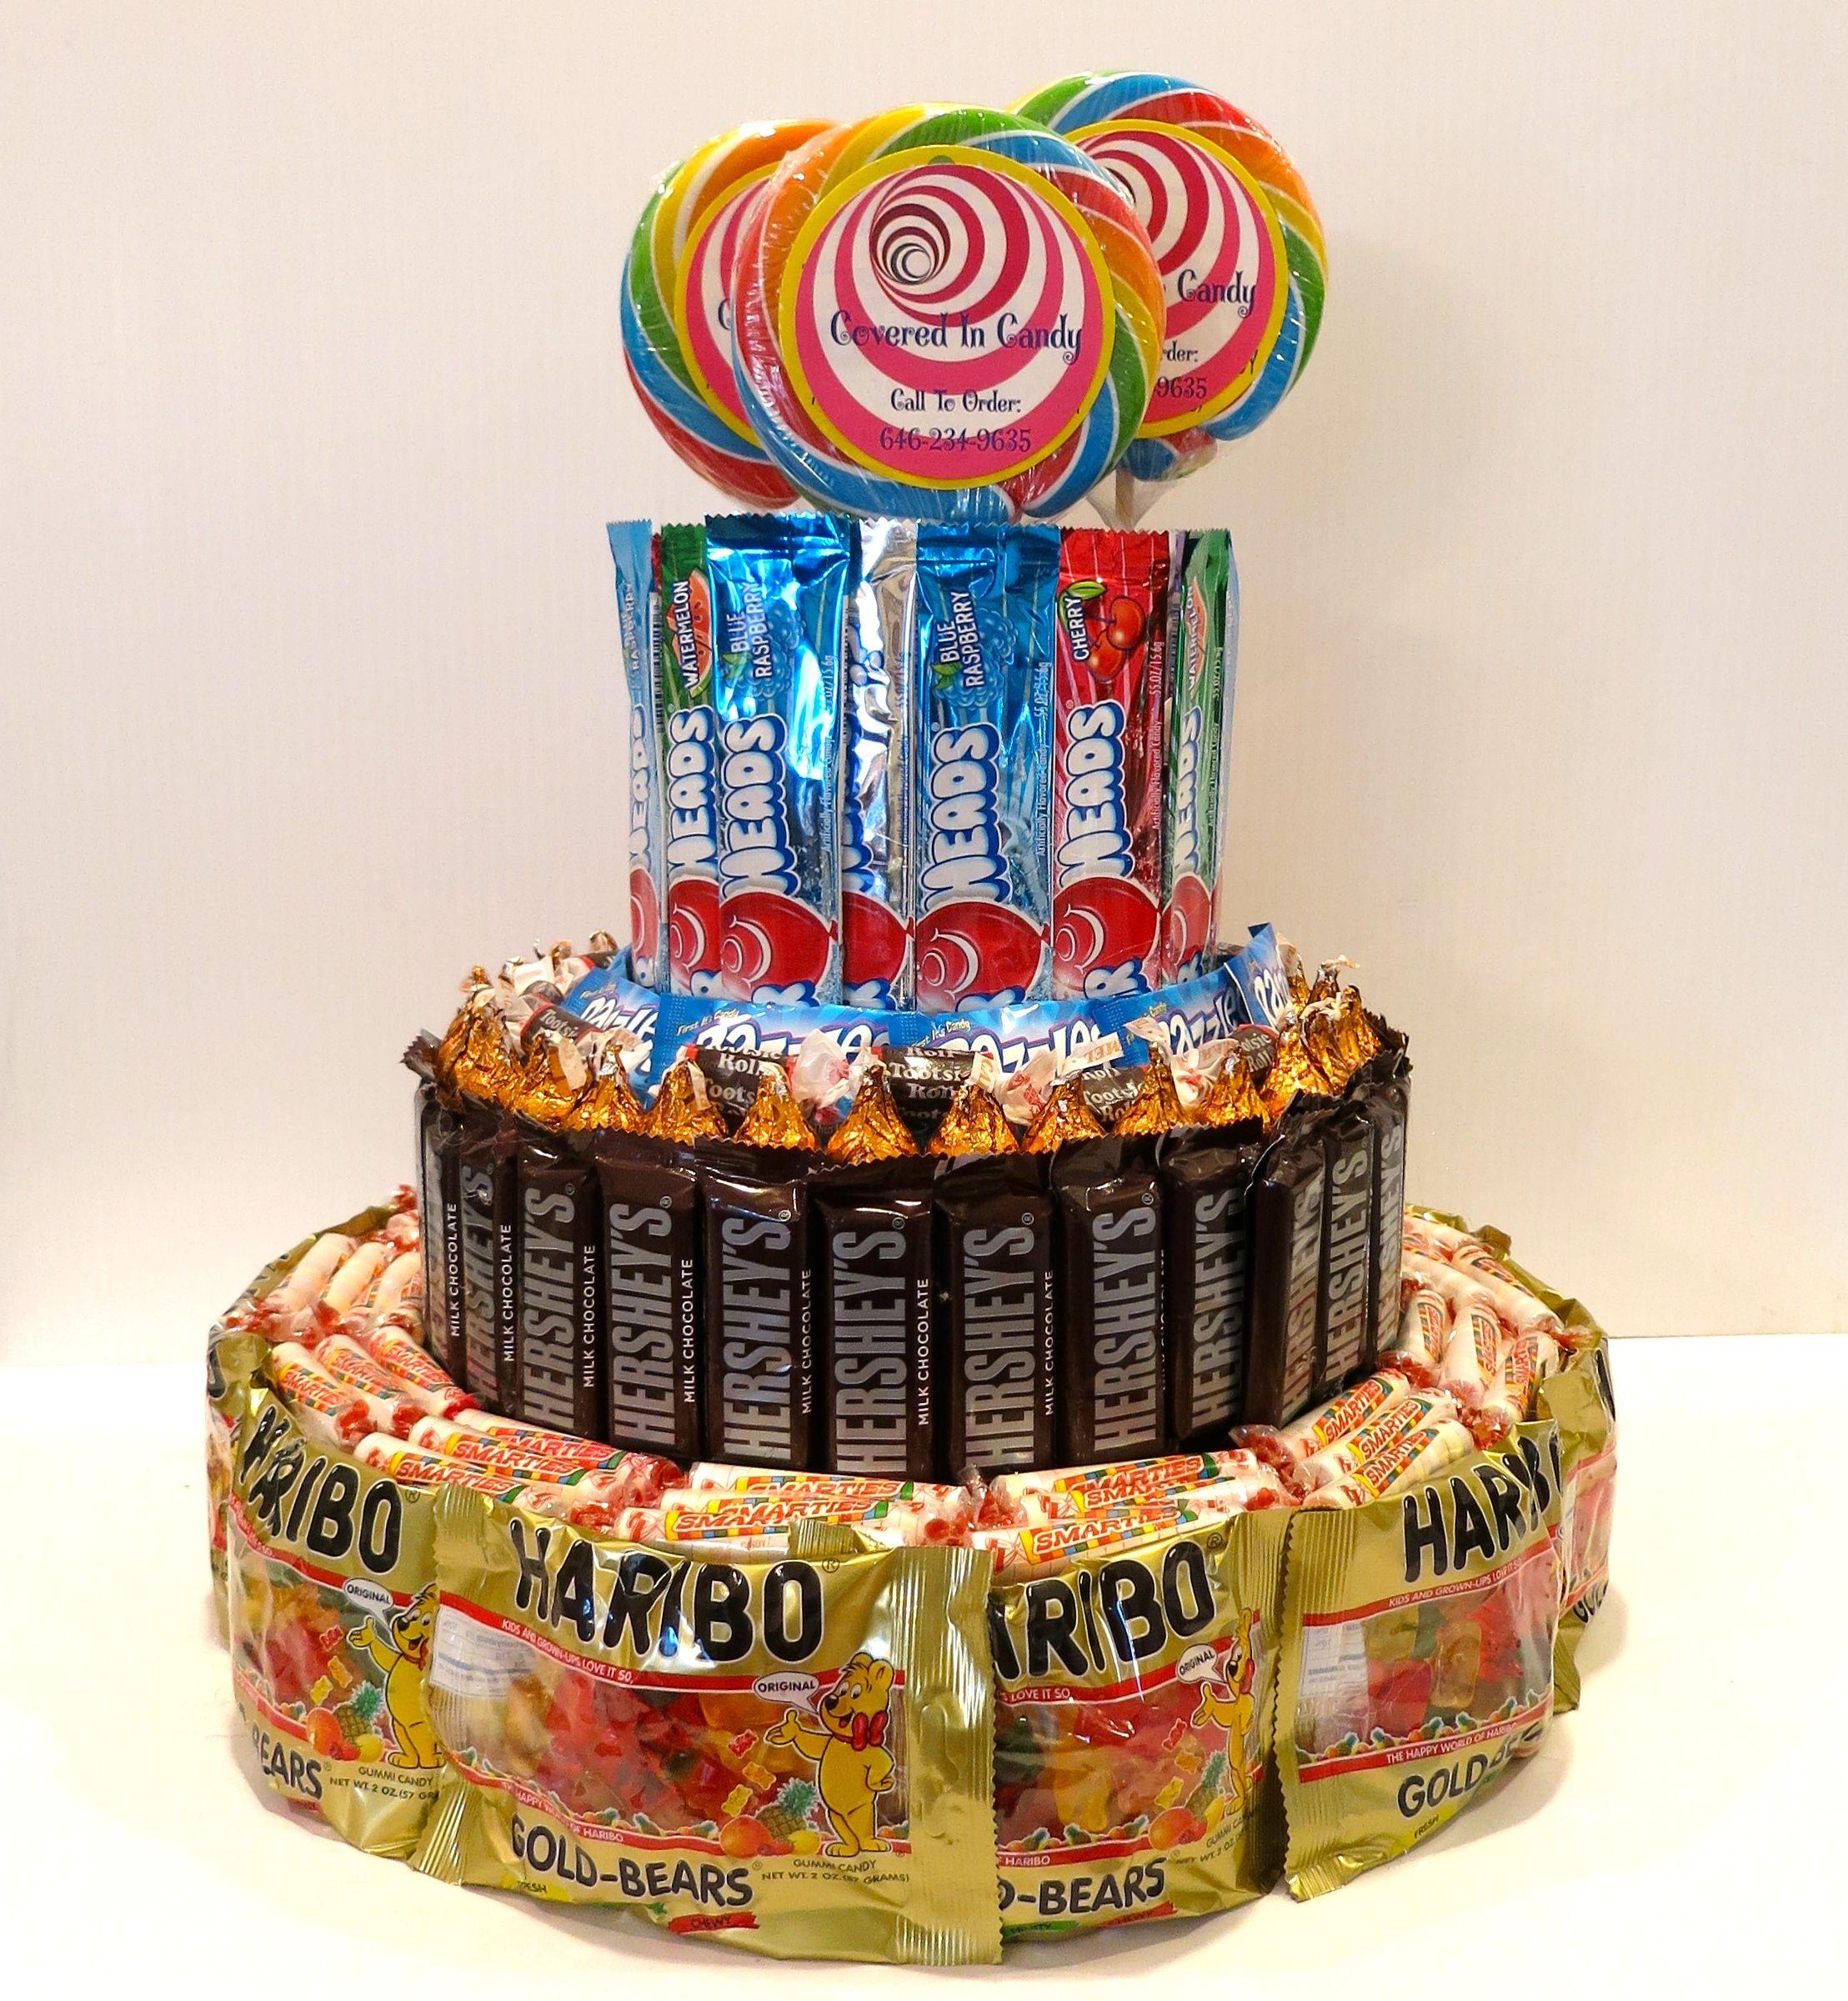 Happy Birthday Candy Cake!